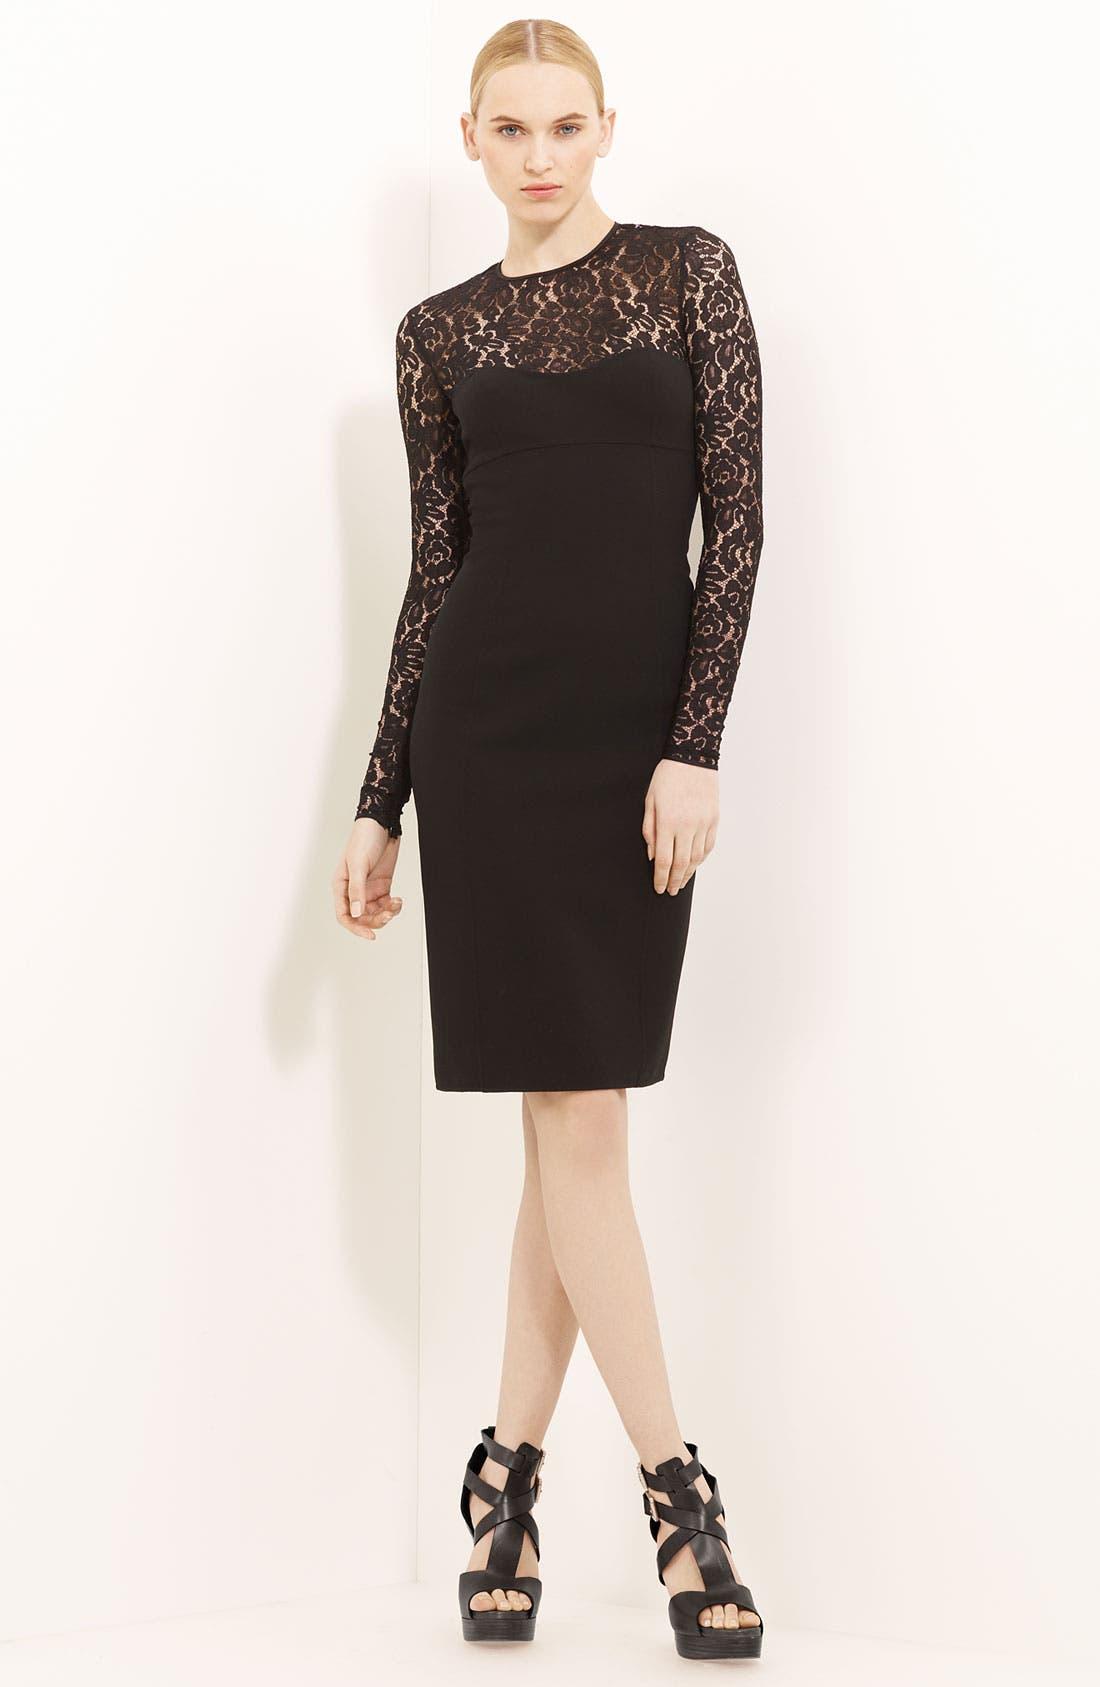 Alternate Image 1 Selected - Michael Kors Lace & Crepe Dress